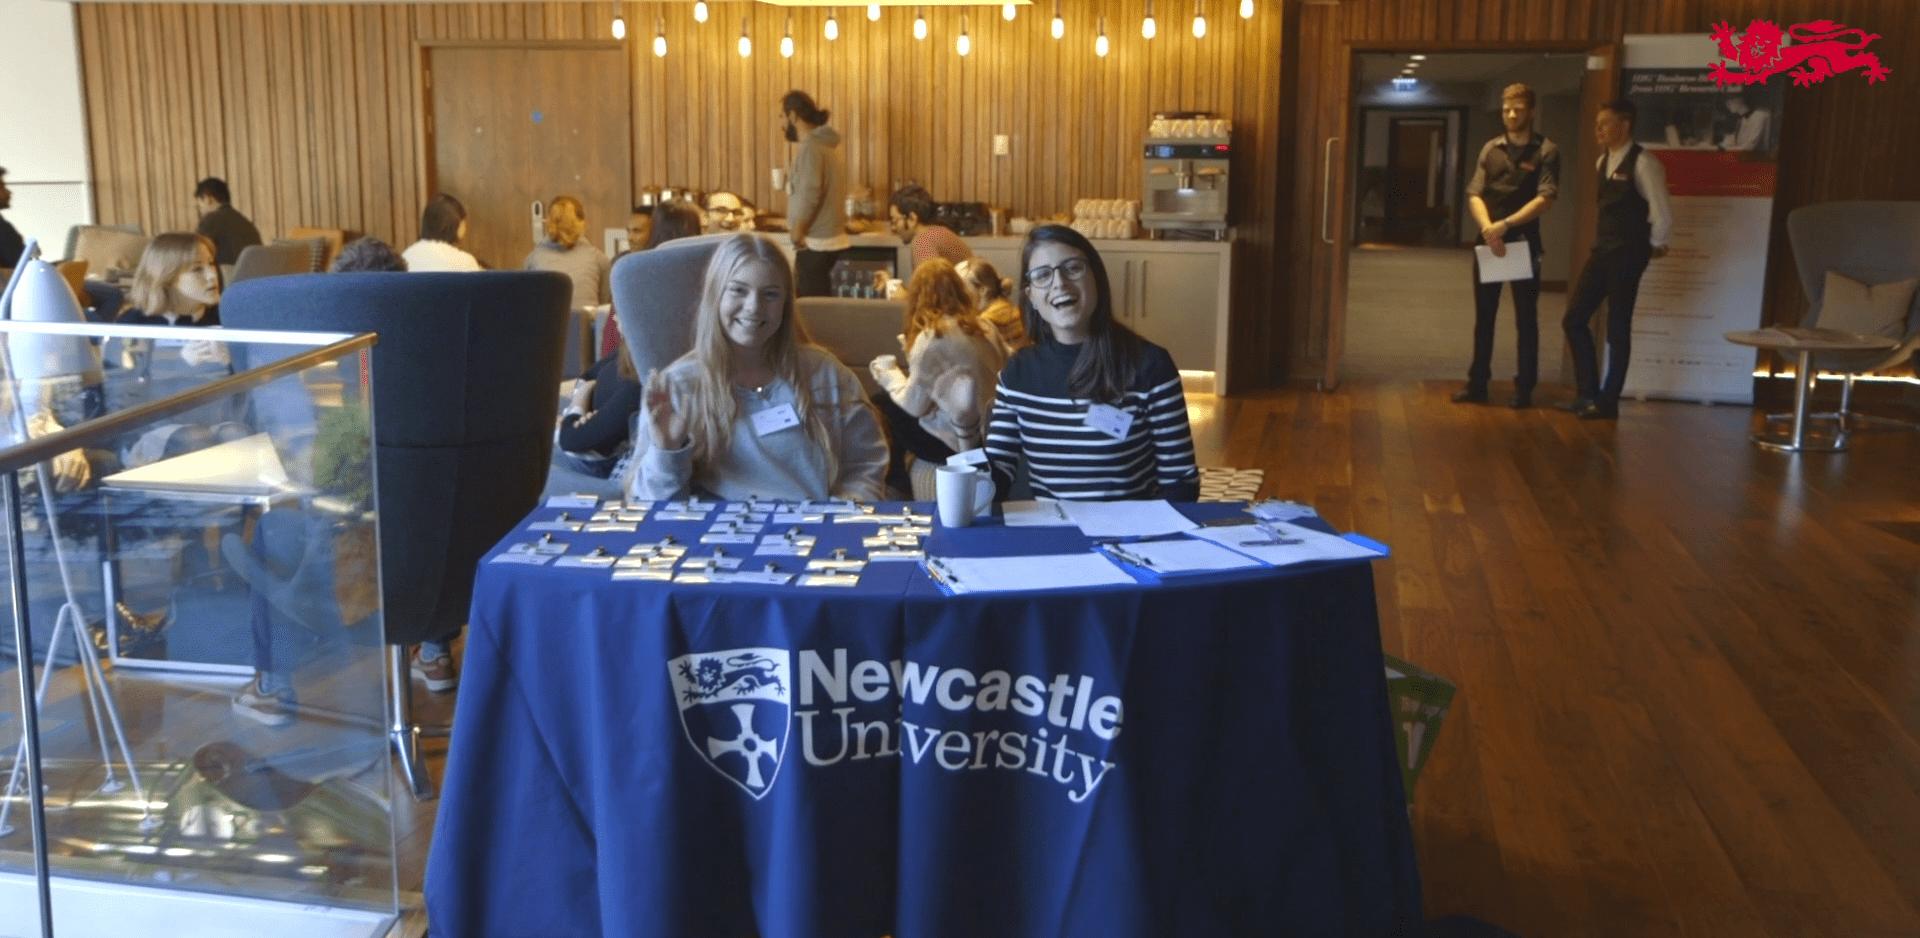 Iday 2016 - NEWCASTLE UNIVERSITY